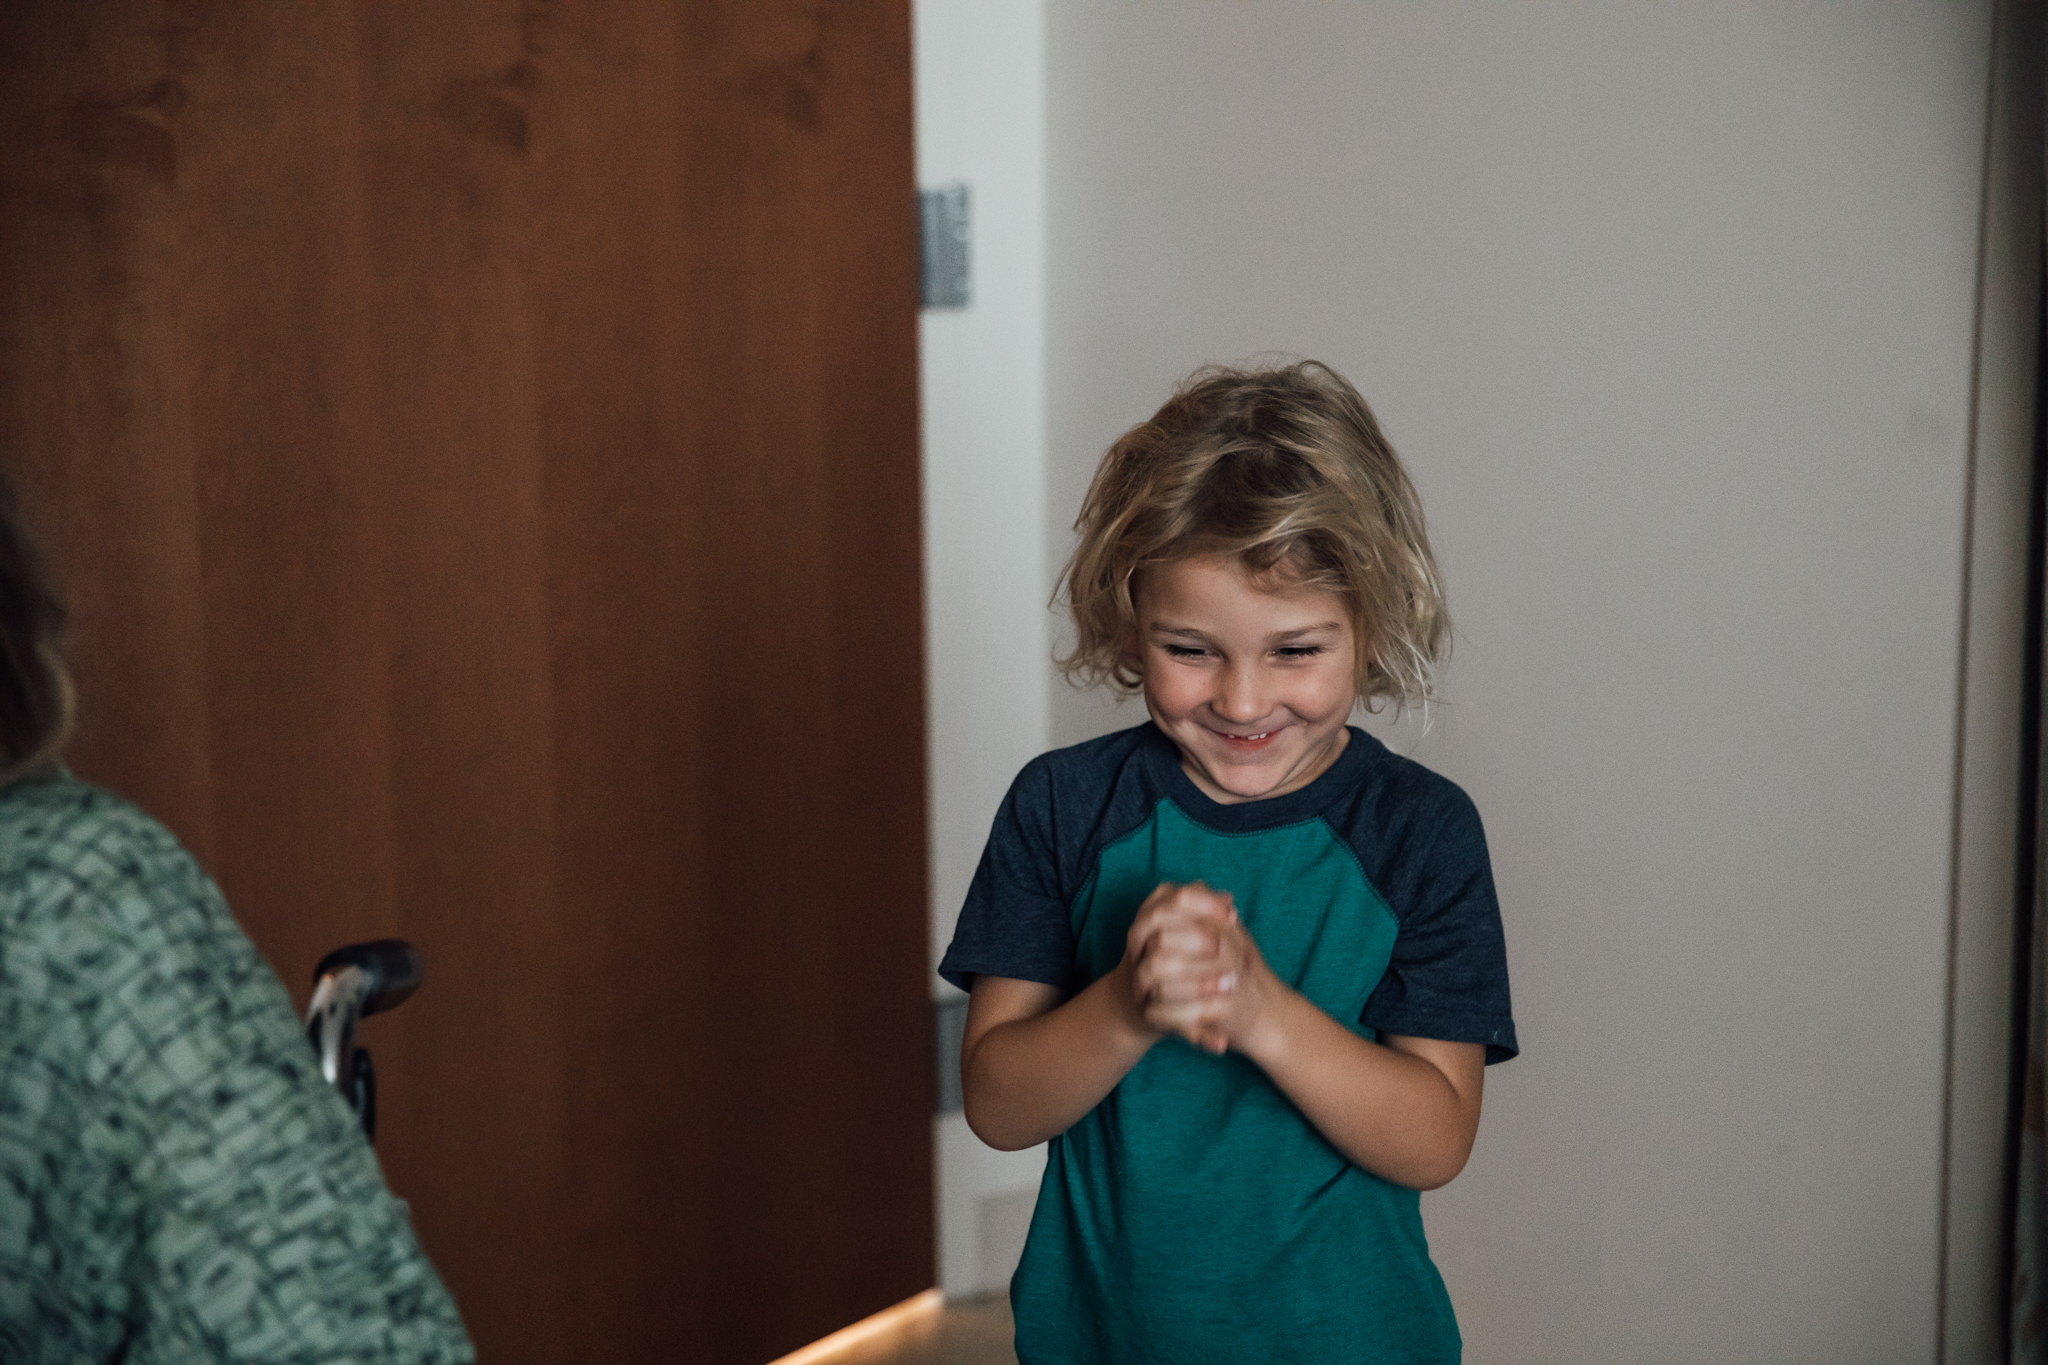 birth-photography-documentary-family-photographer-147.jpg